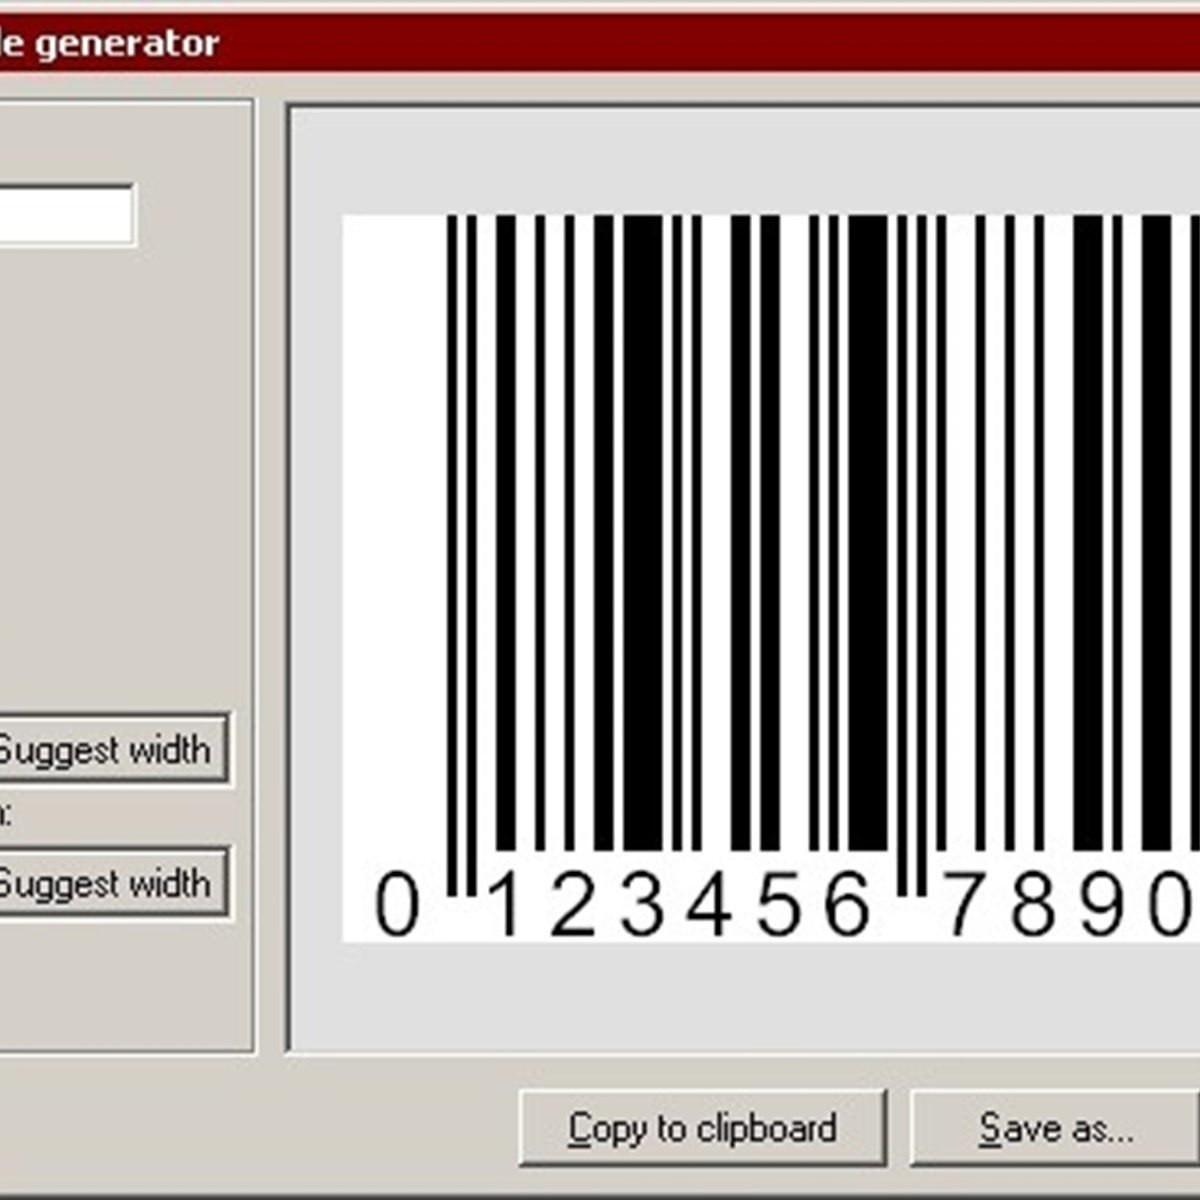 EAN-13 Barcode Generator Alternatives and Similar Software ...